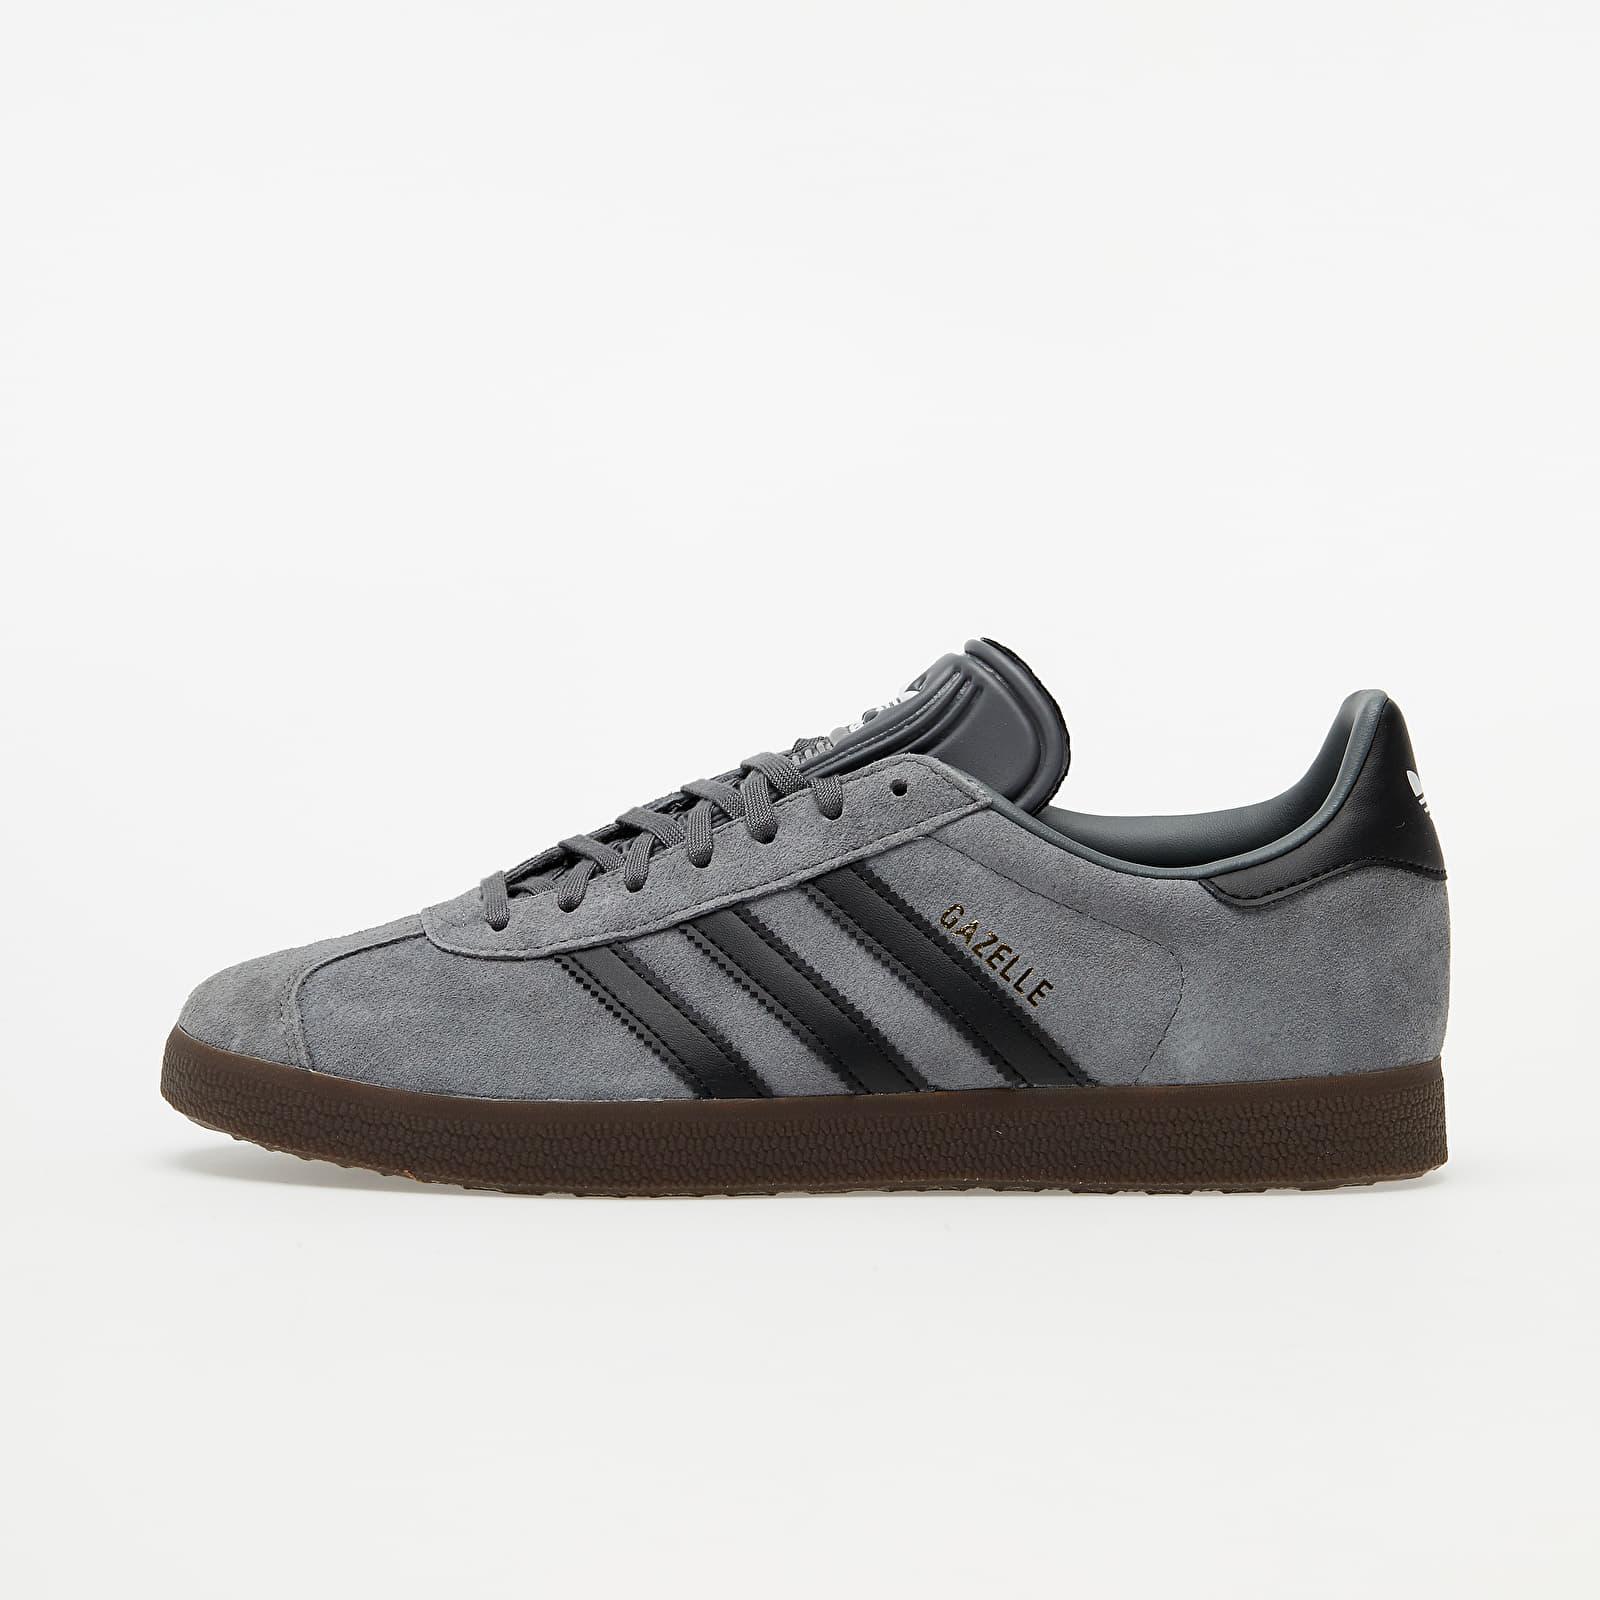 Zapatillas Hombre adidas Gazelle Grey Four/ Core Black/ Gum 5